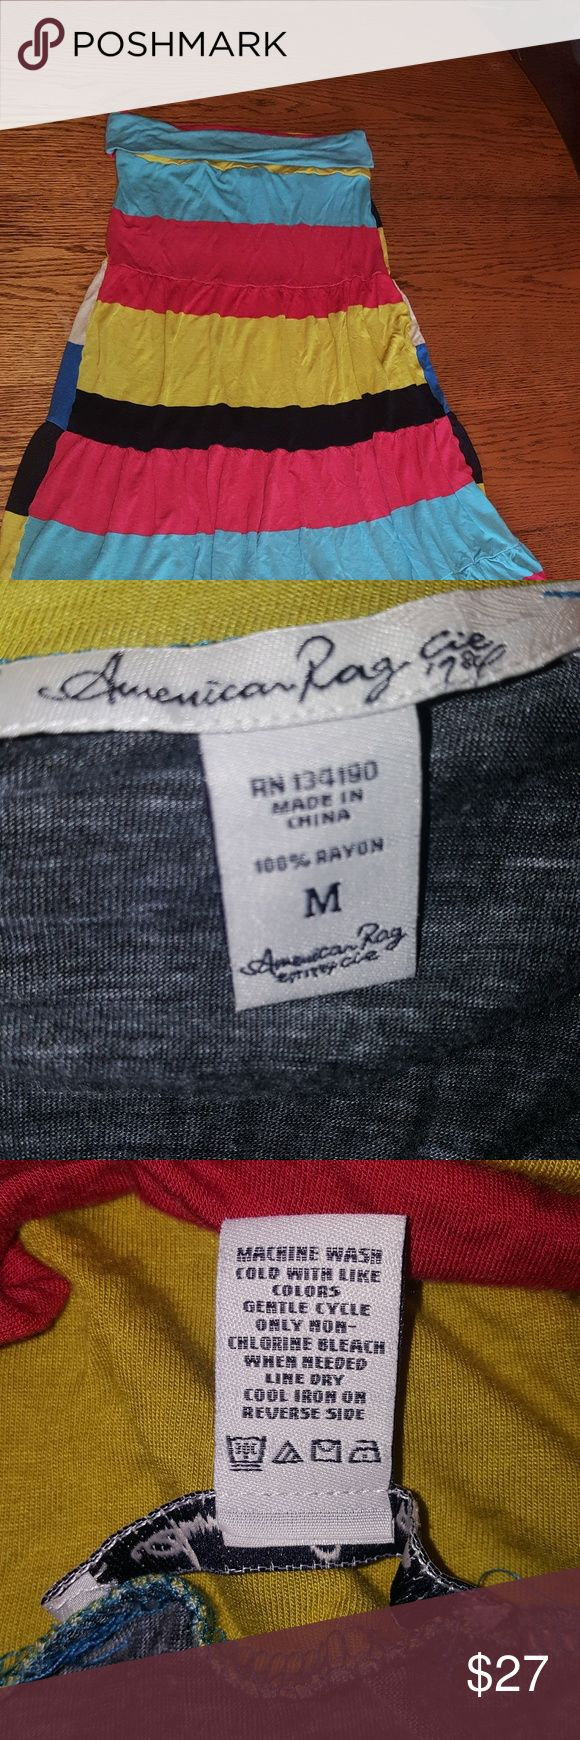 American Rag strapless dress SZ medium Trendy & comfortable  striped multicolor  strapless dress  GUC  Super fast shipping  T2-2 American Rag Dresses Strapless